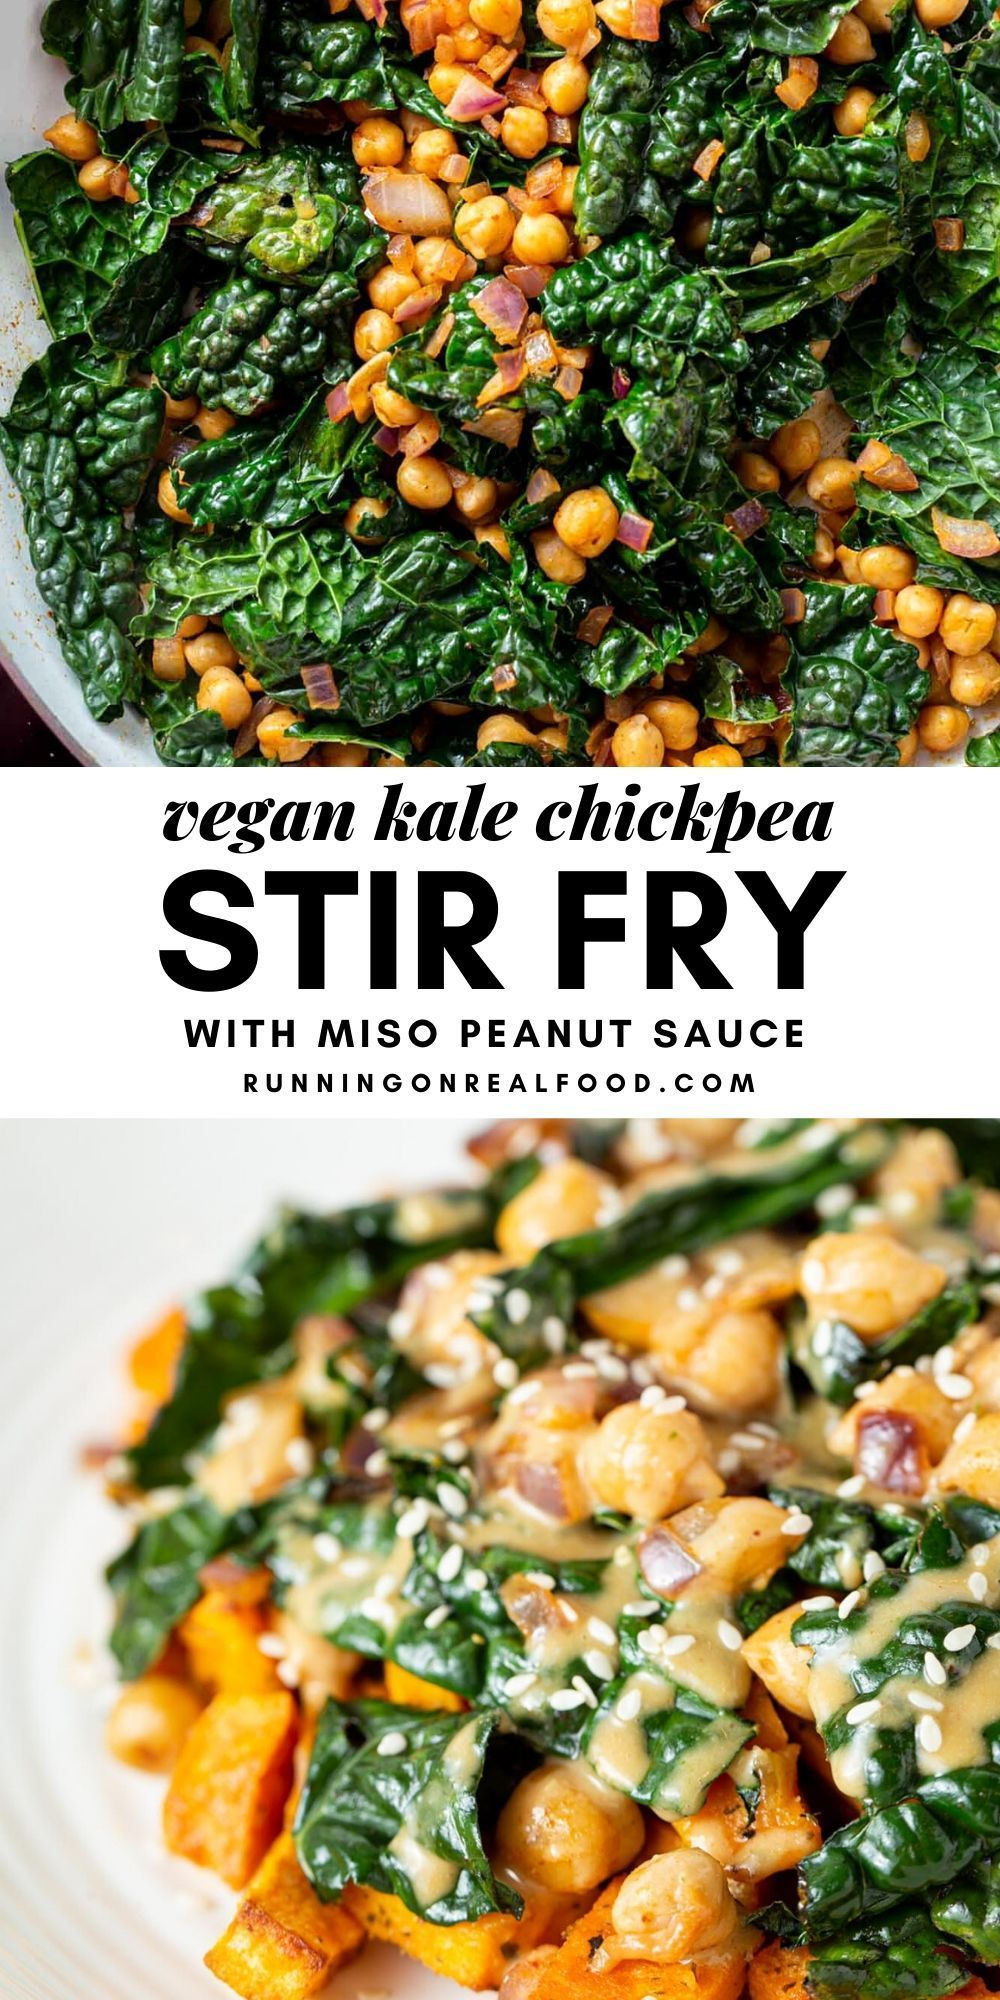 Vegan Kale Chickpea Stir Fry